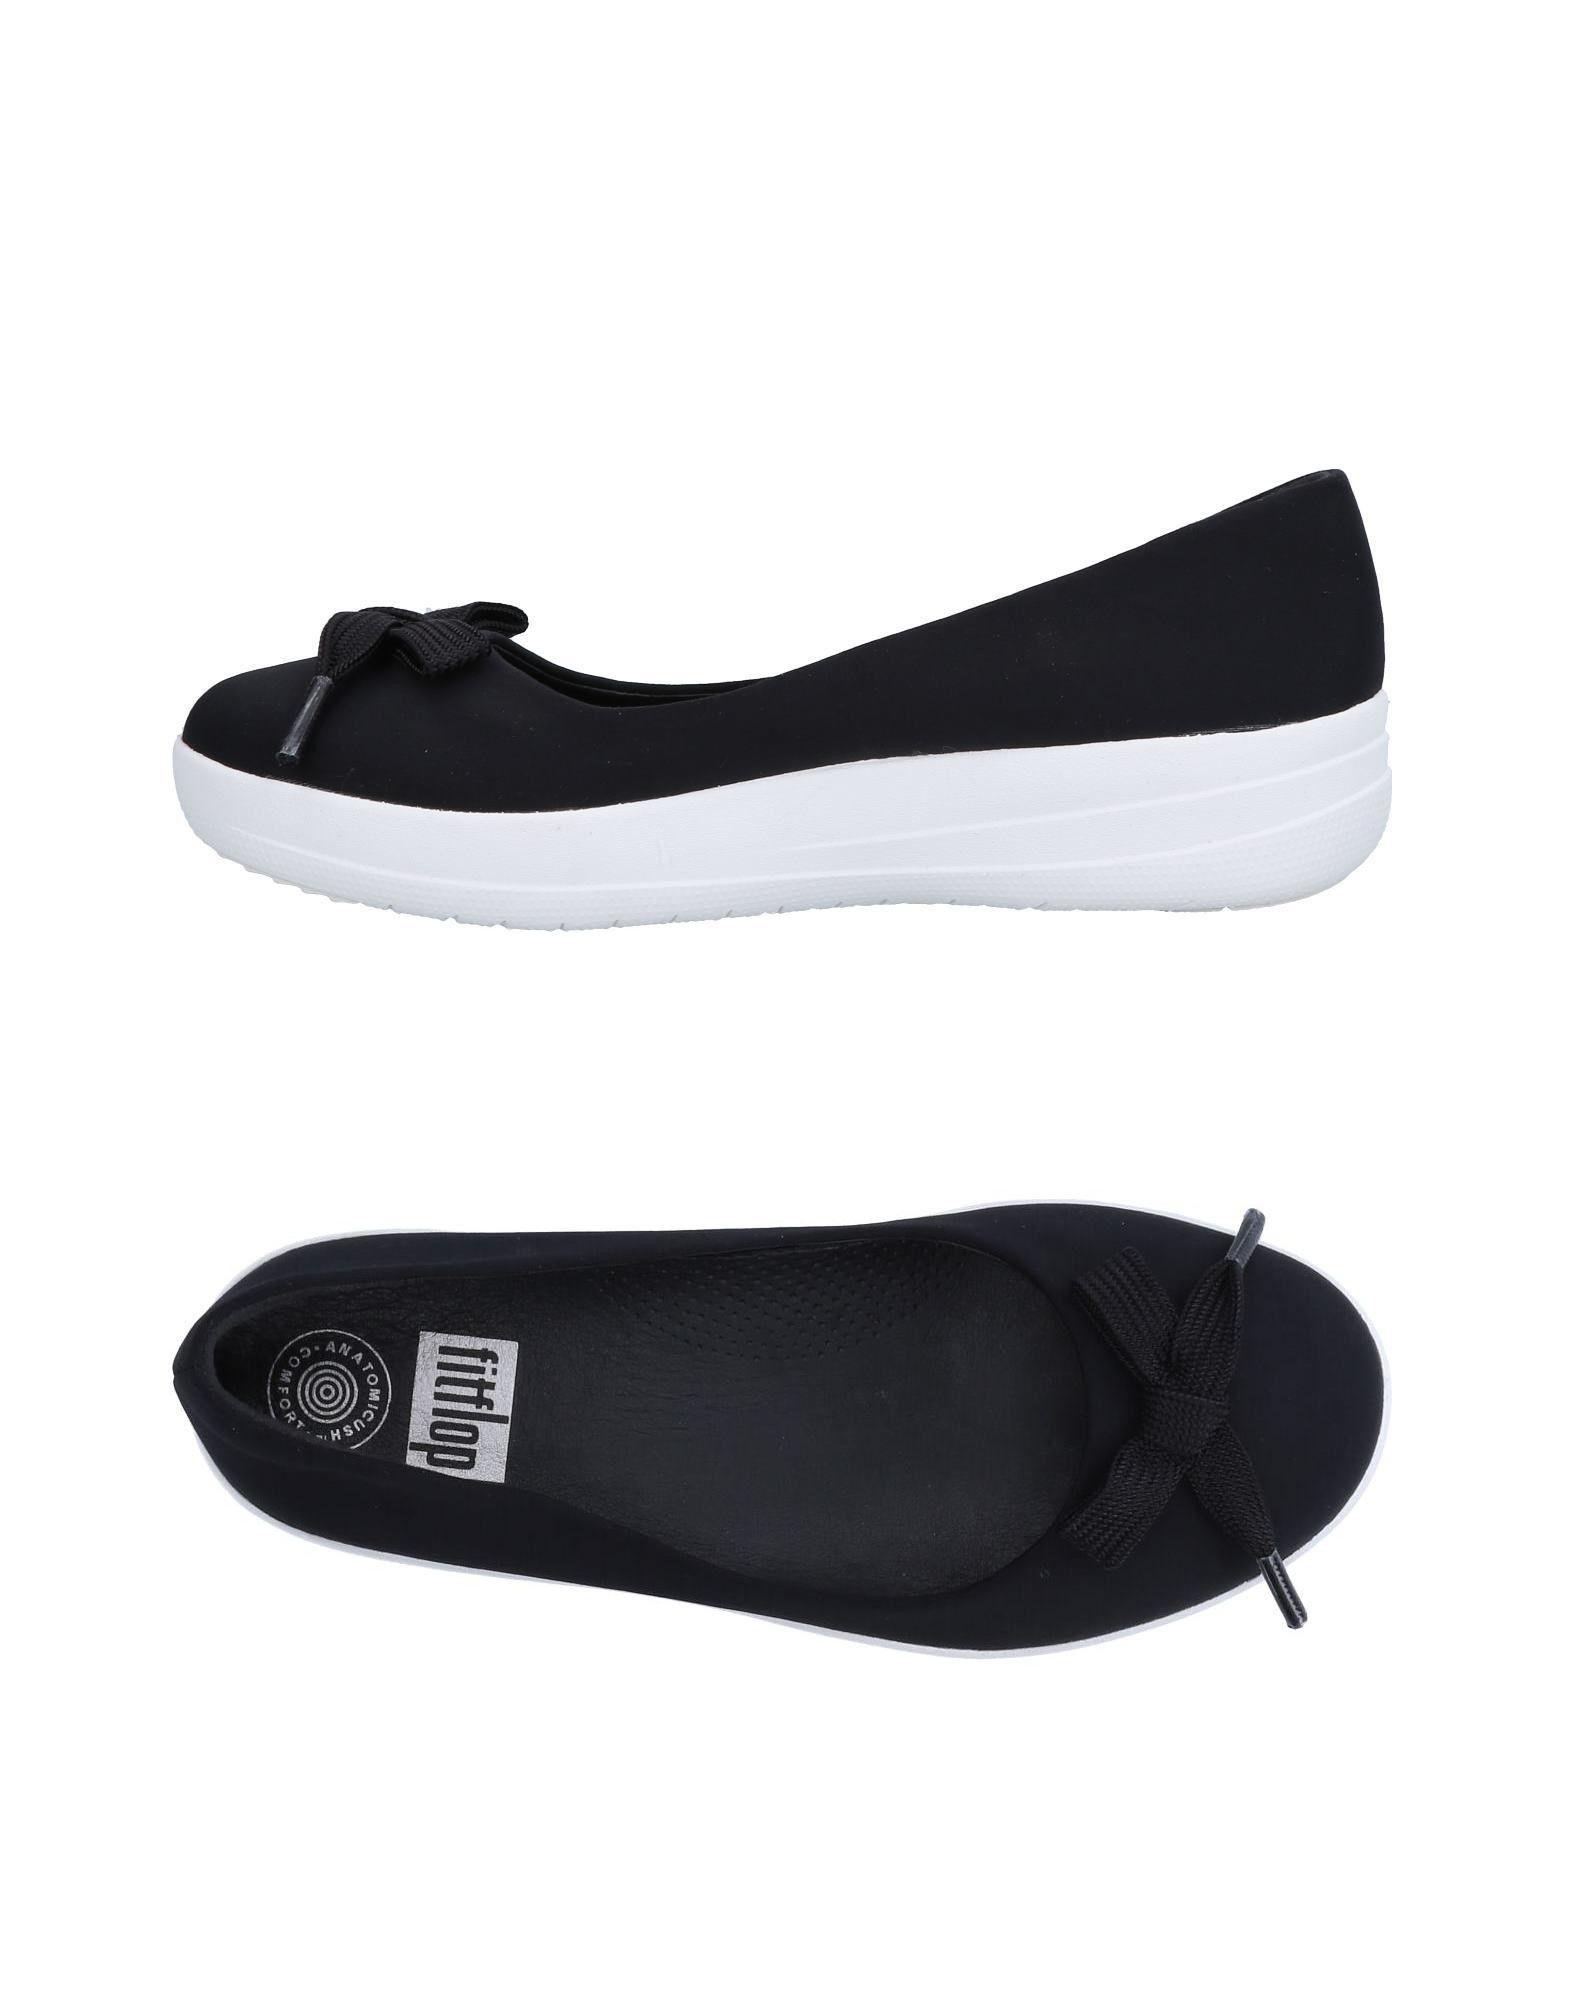 Haltbare Mode billige Schuhe Fitflop Pumps Damen  11506413EK Heiße Schuhe